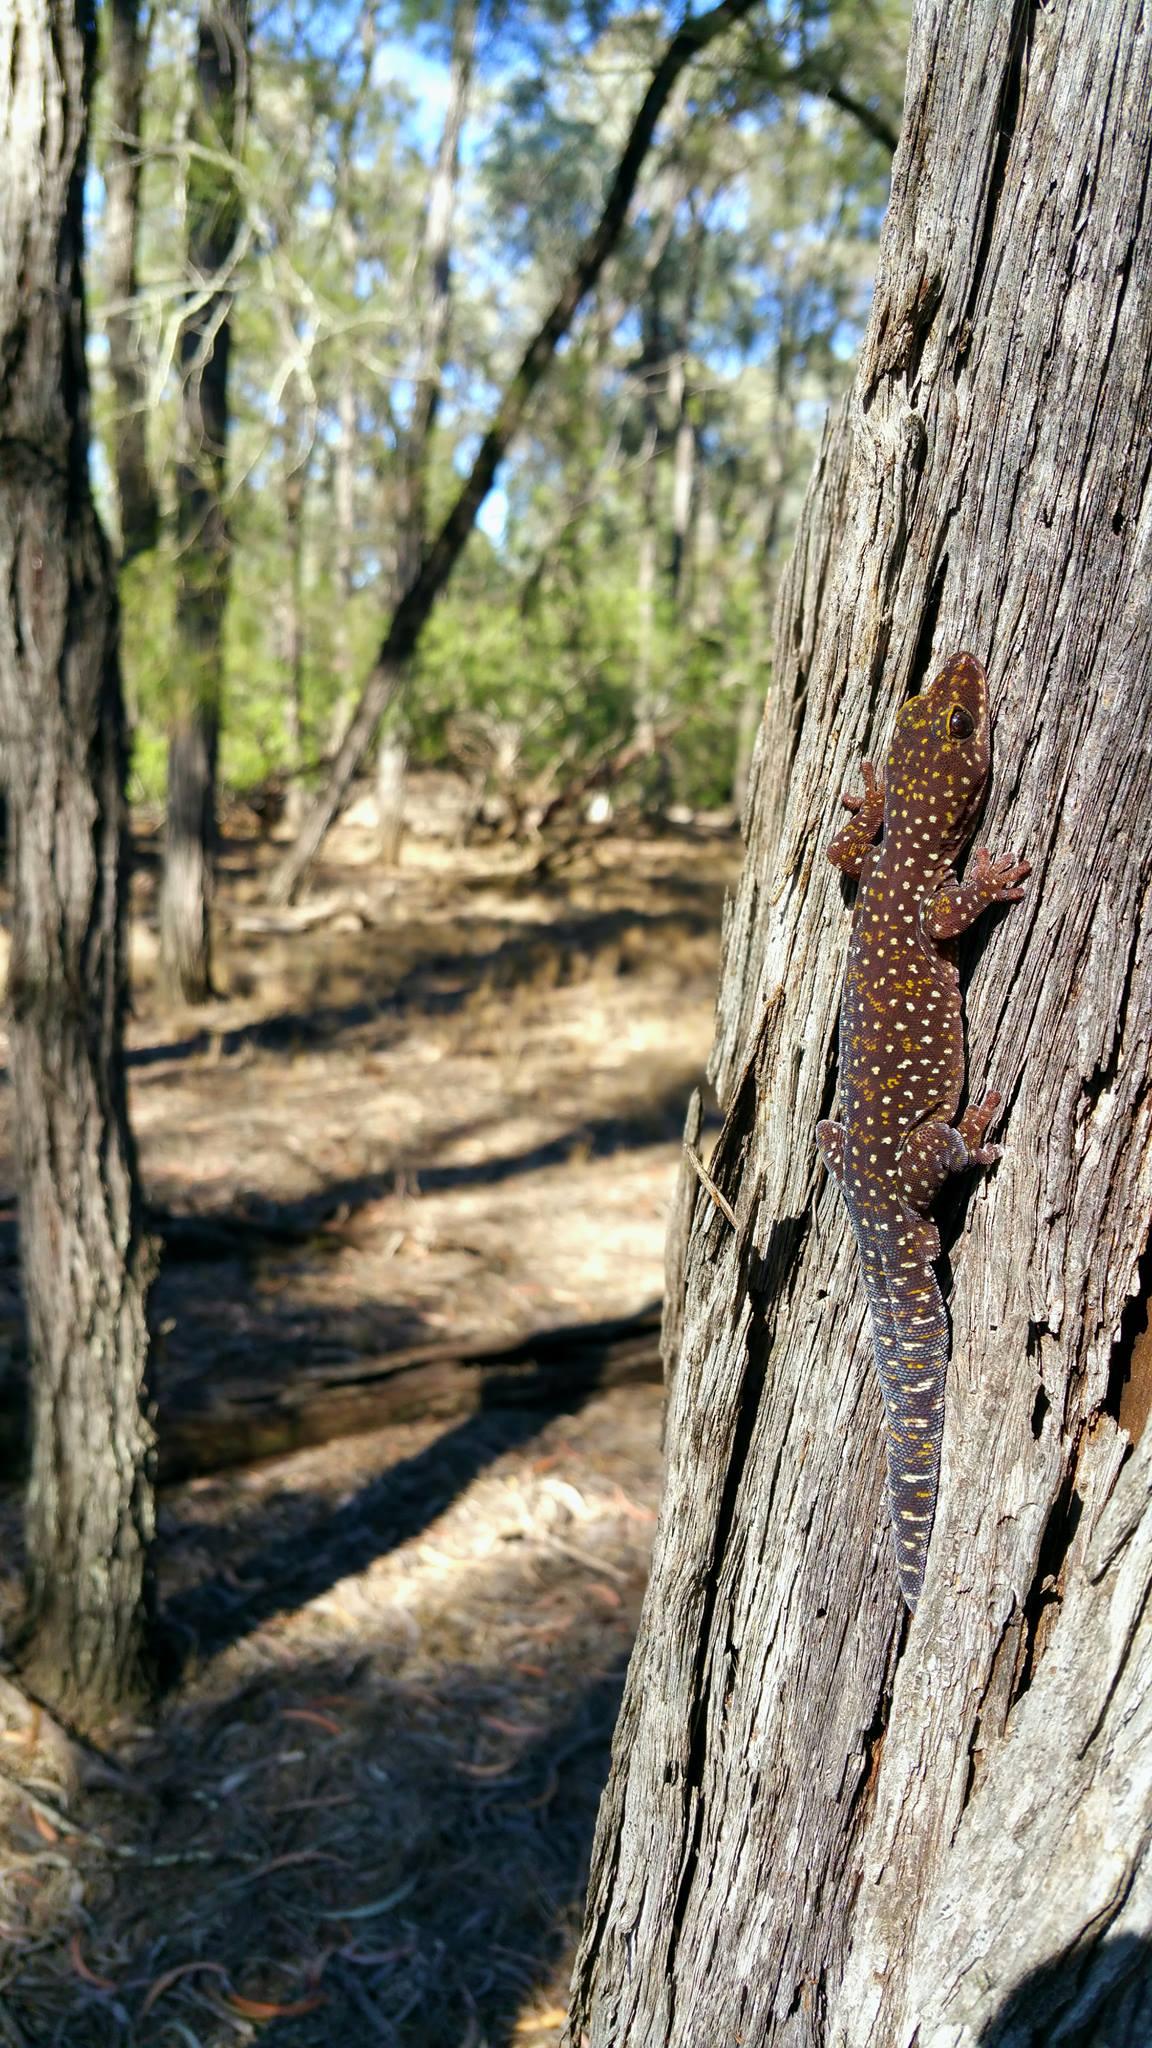 Fauna Spotting